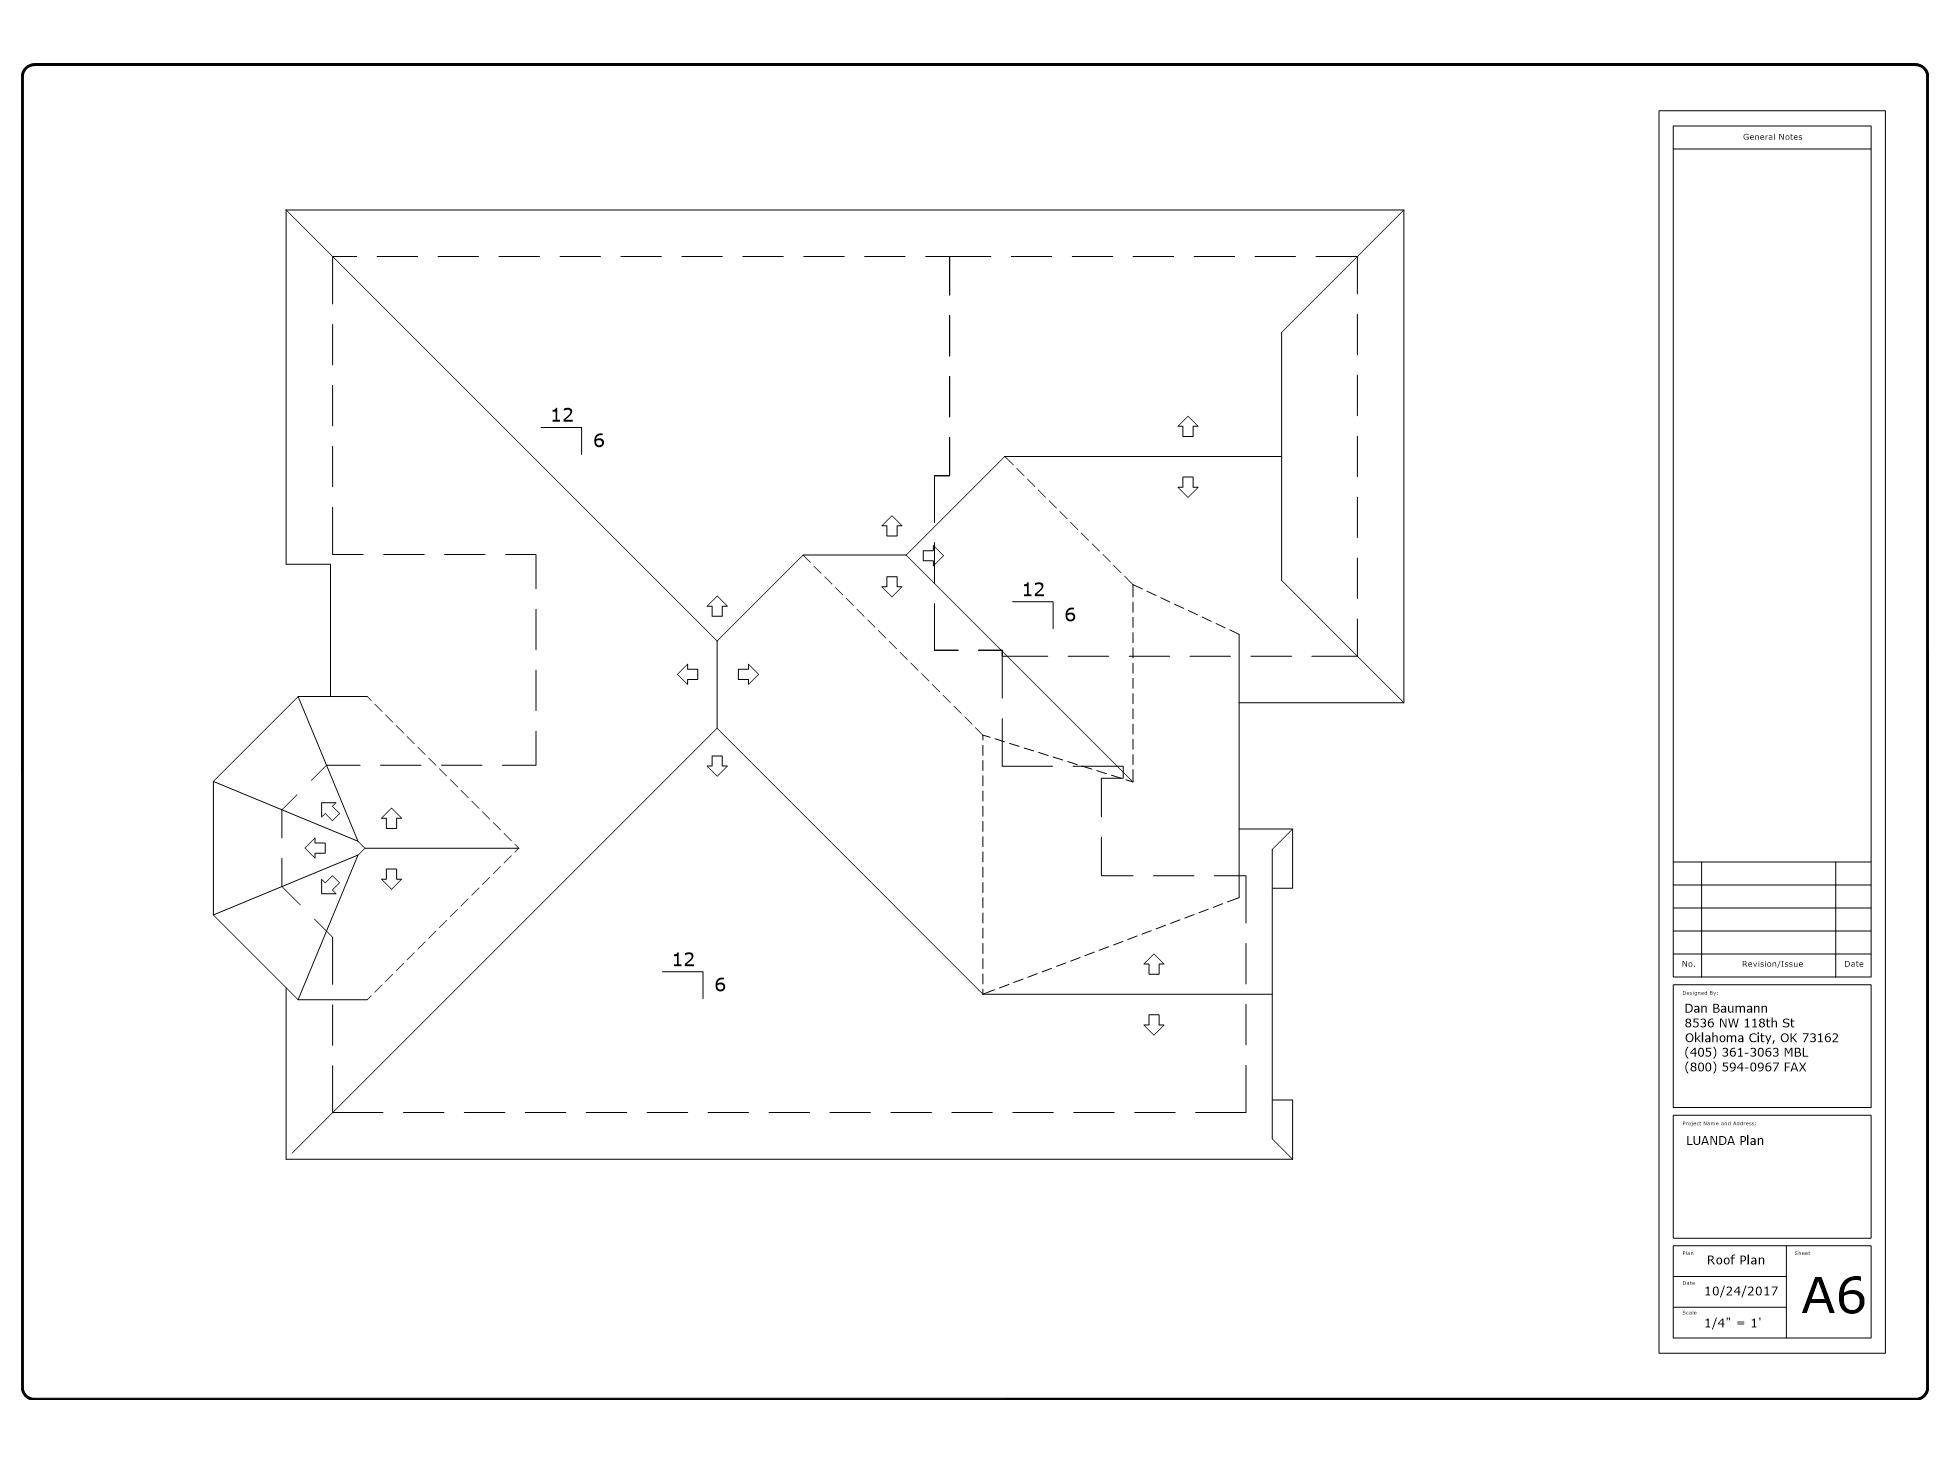 Luanda Plan Roof Pitch